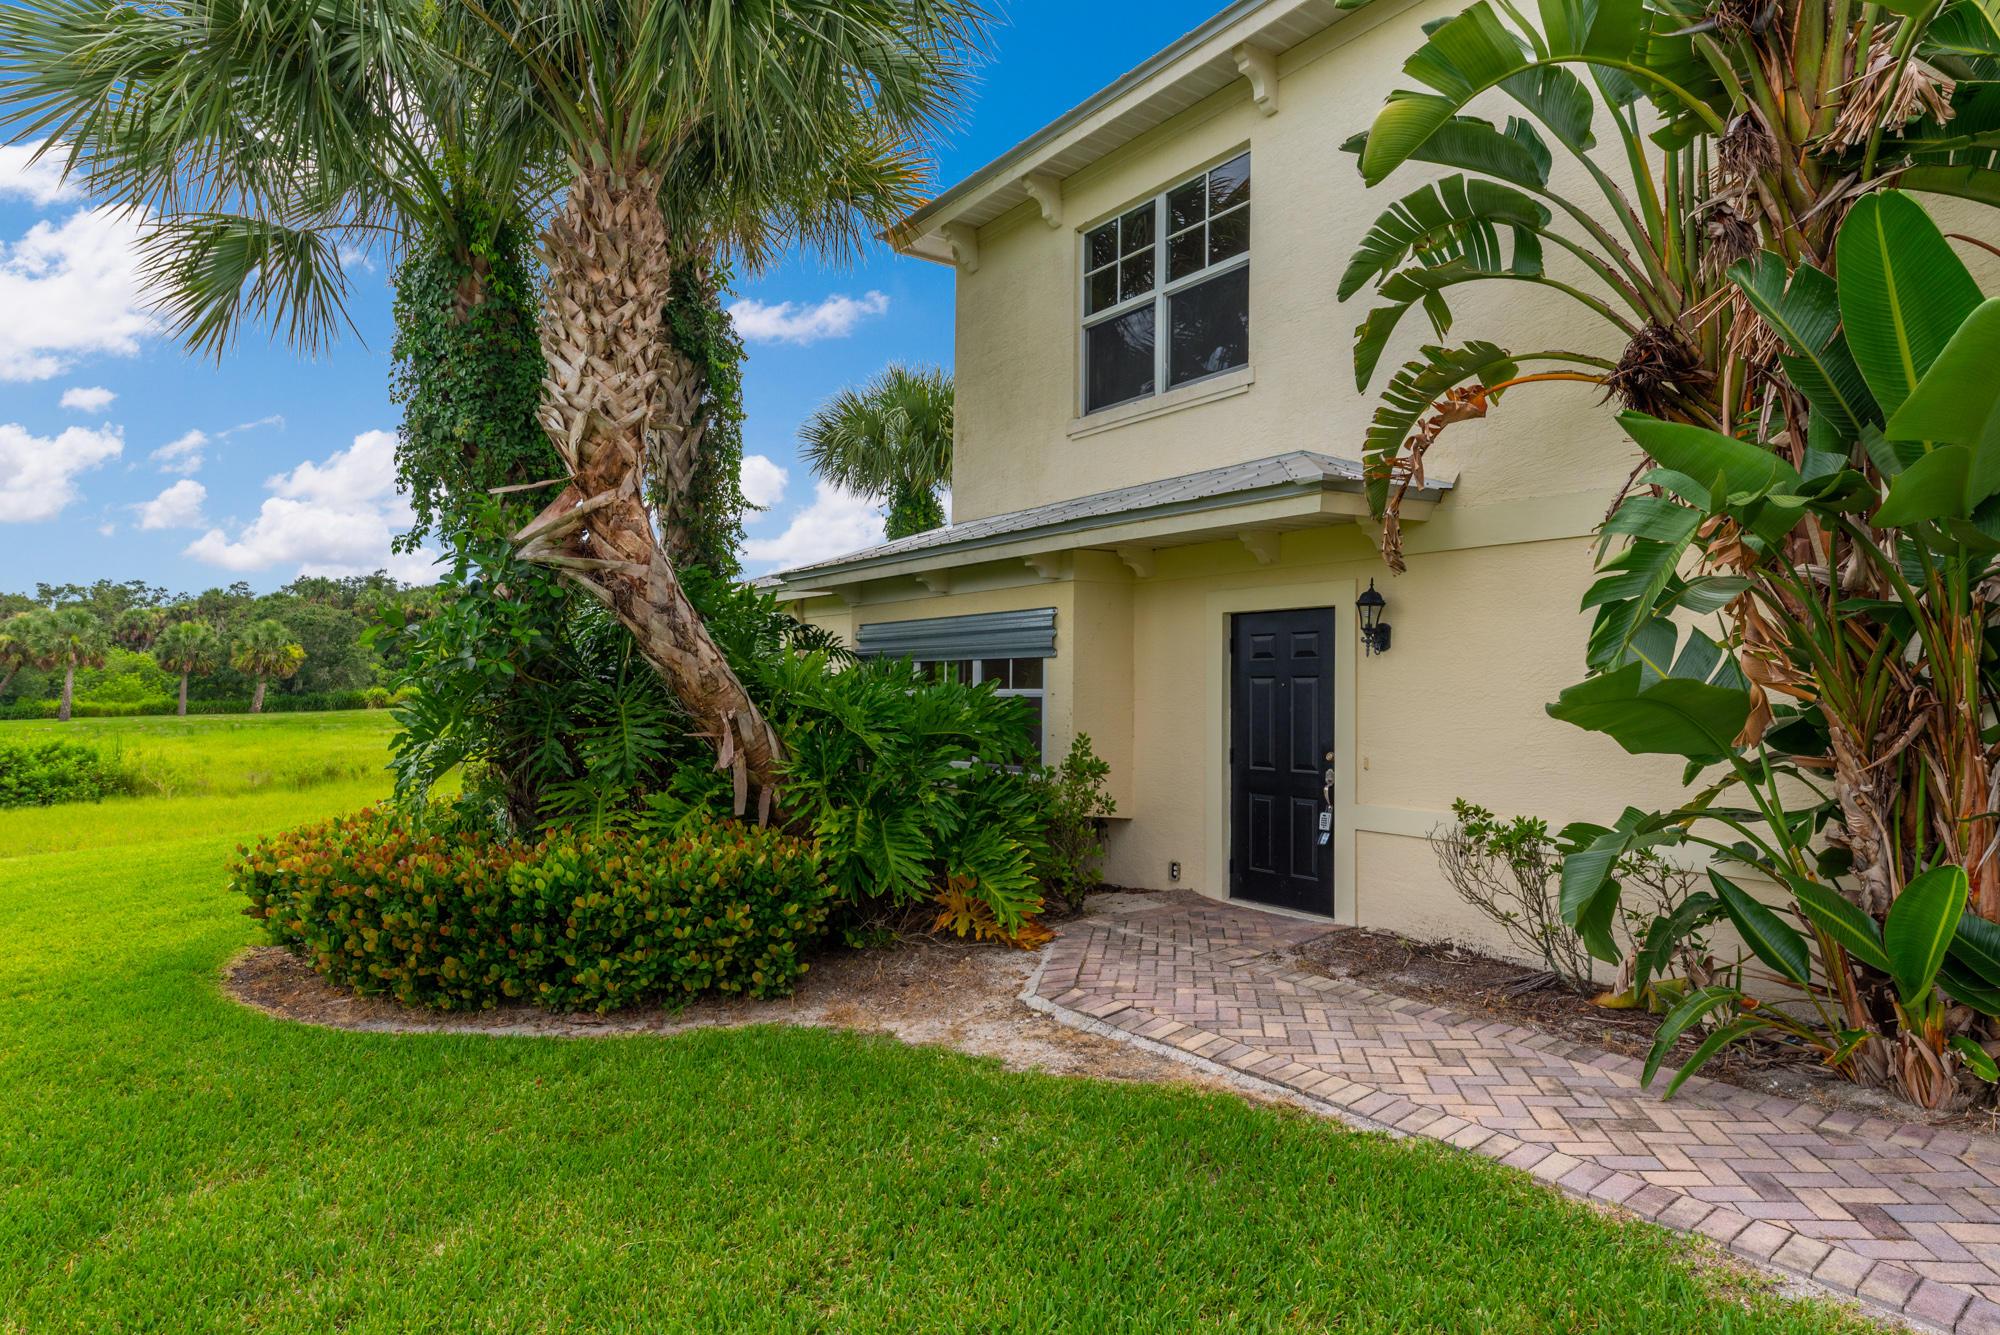 3916 Sabal Way, Fort Pierce, FL 34981